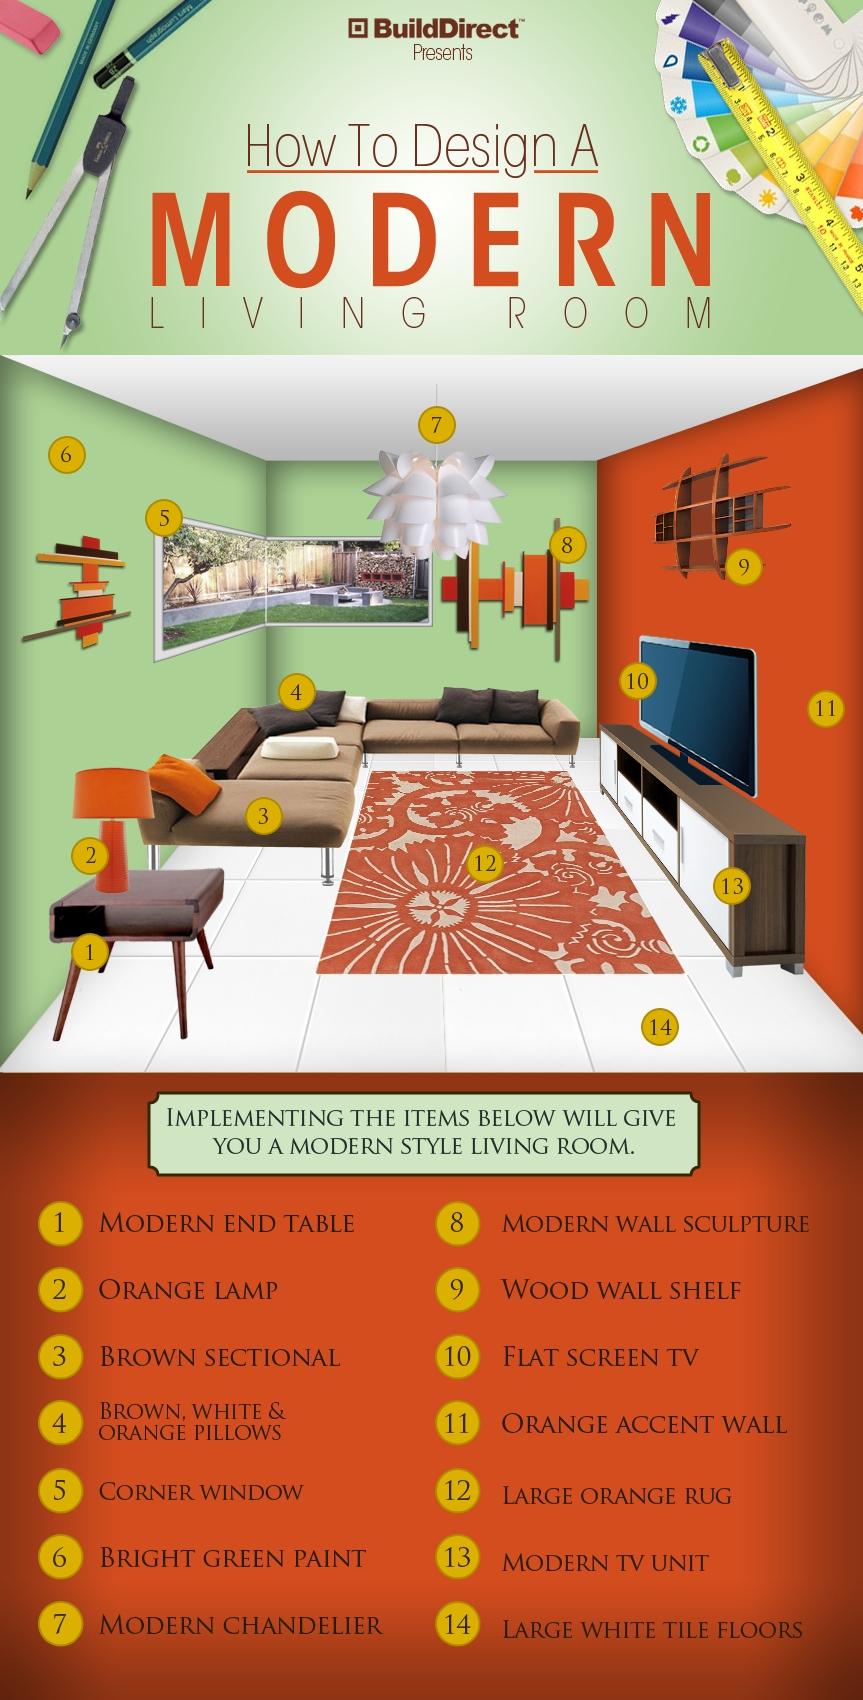 mid century modern living room design ideas mid century room design 2 BuildDirect